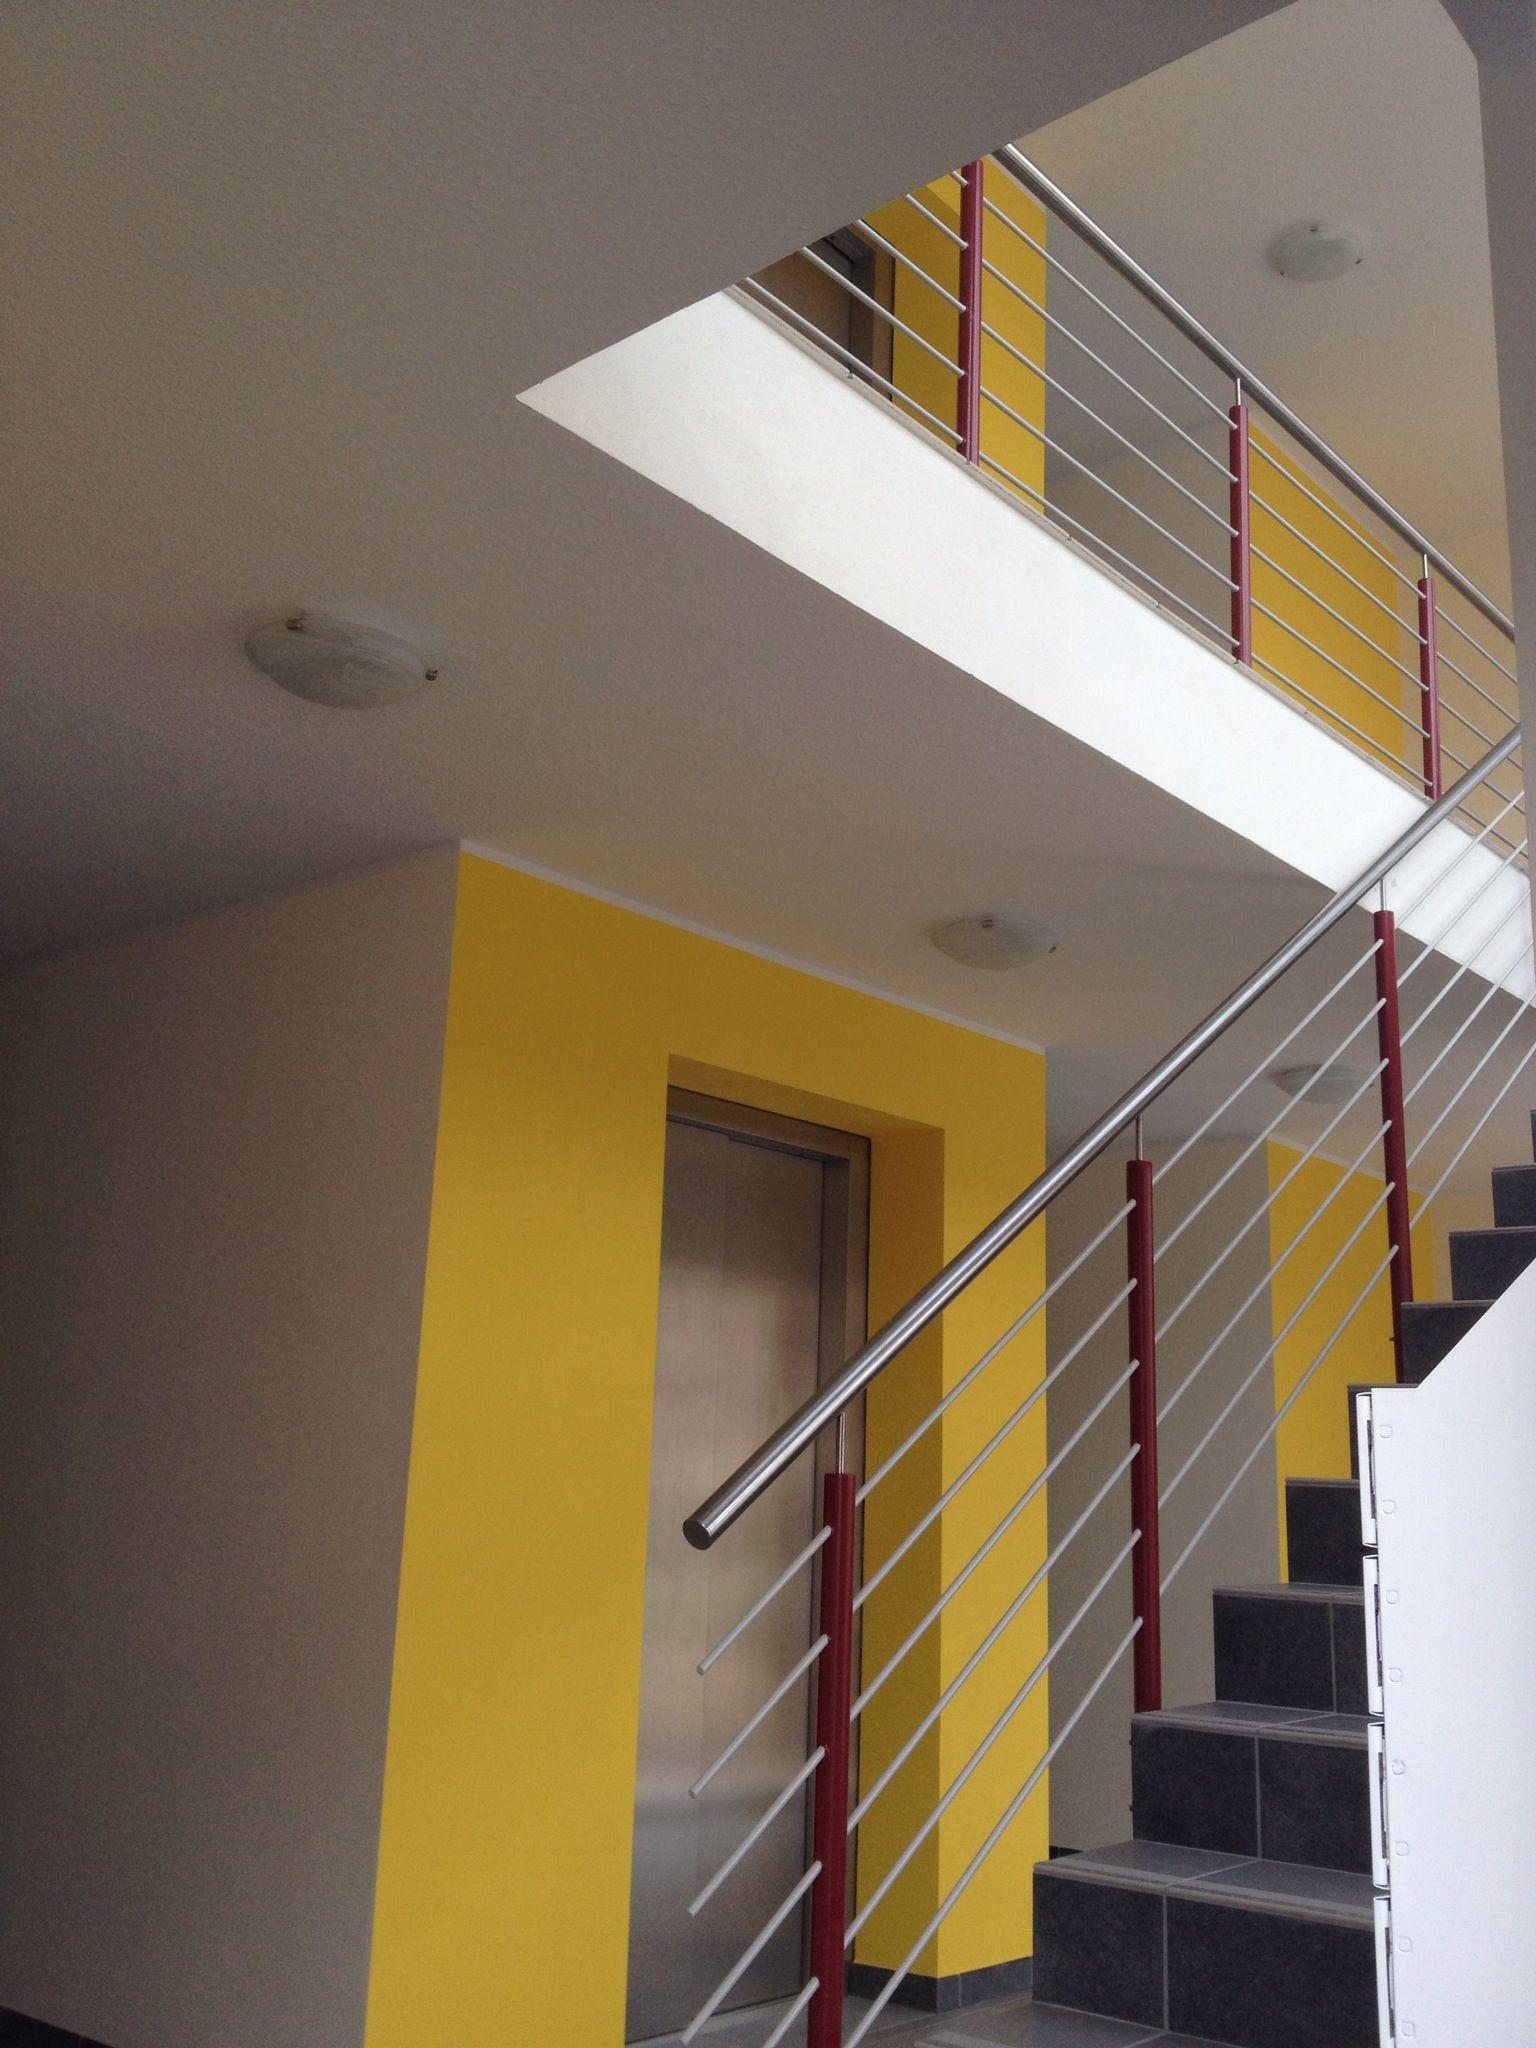 Treppenhaus Gestaltung. | Treppenhaus | Pinterest Gestaltung Treppenhaus Altbau